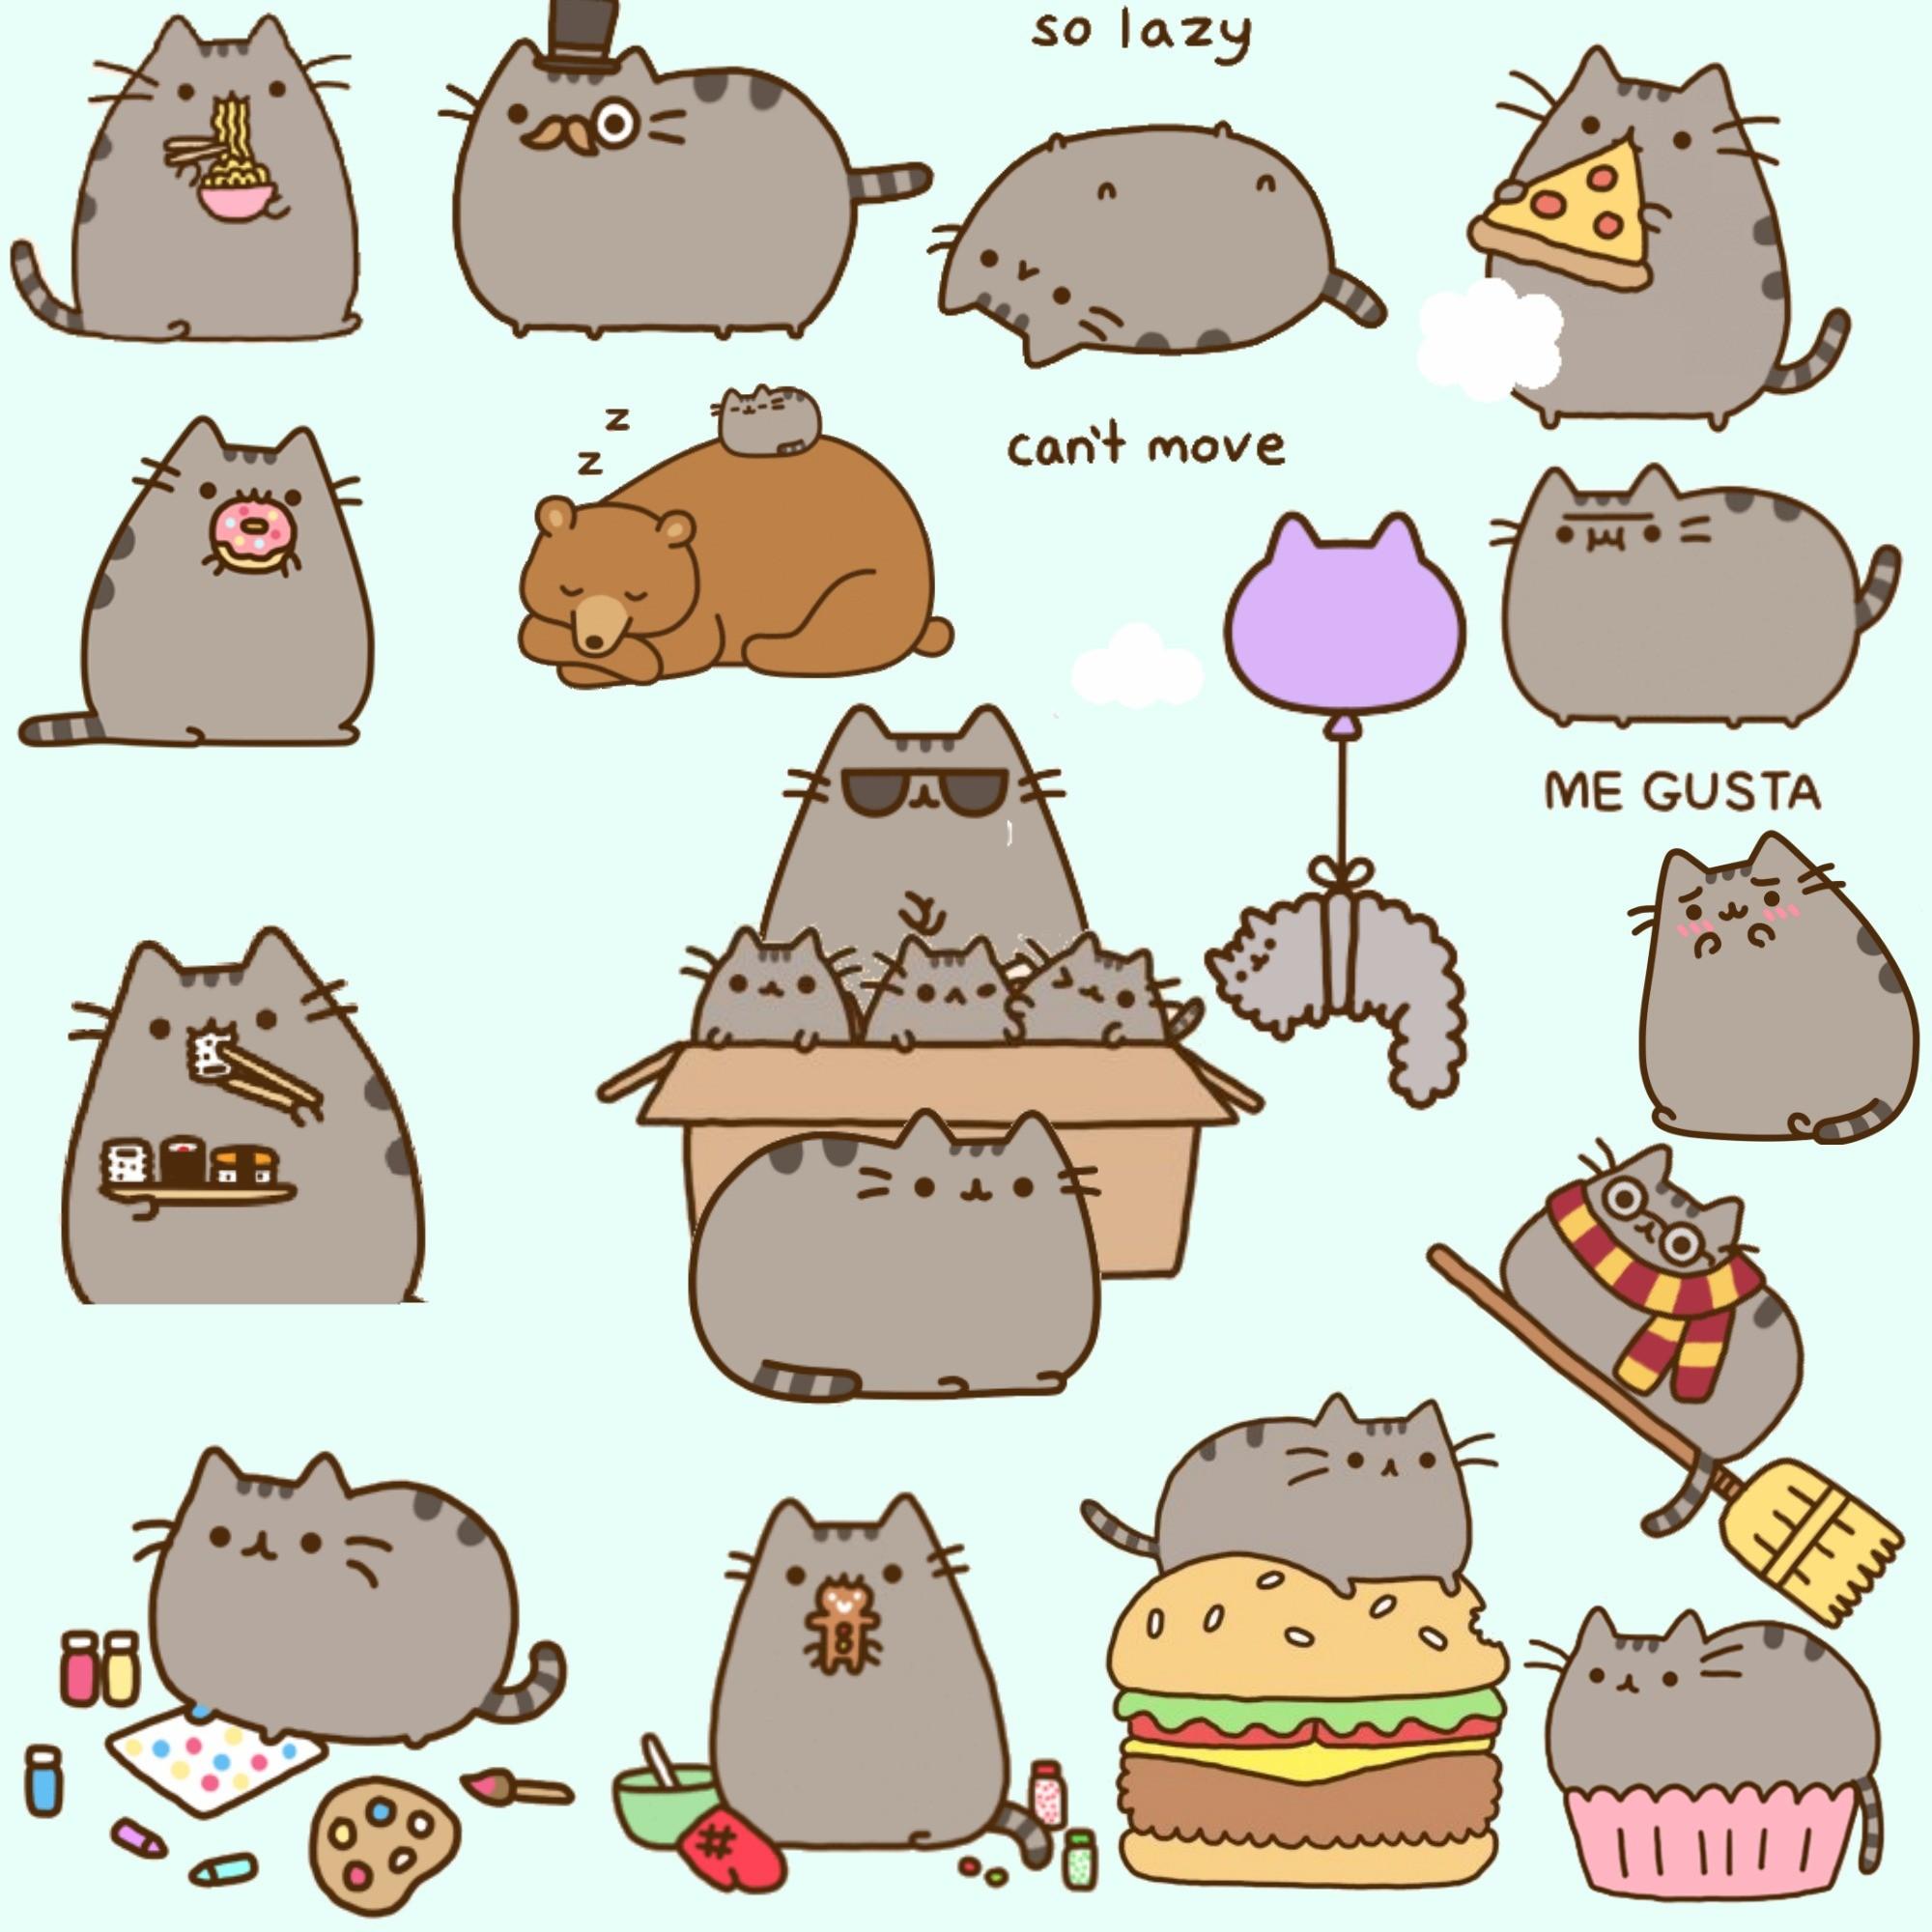 cats cute japan japanese kawaii pusheen collage all rights belong